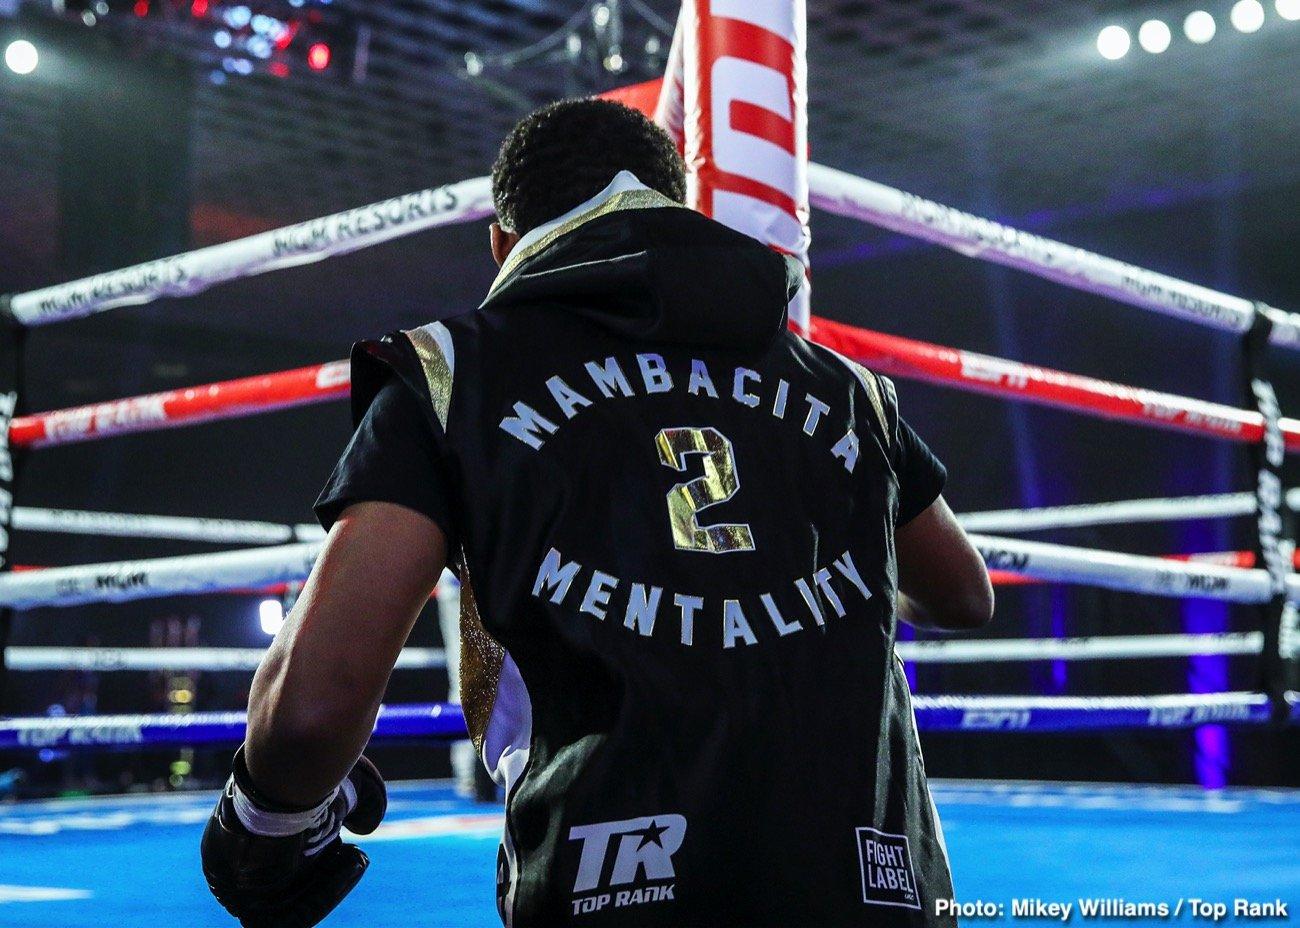 Edgar Berlanga, Felix Verdejo, Robeisy Ramirez, Shakur Stevenson, Toka Kahn Clary - Boxing News